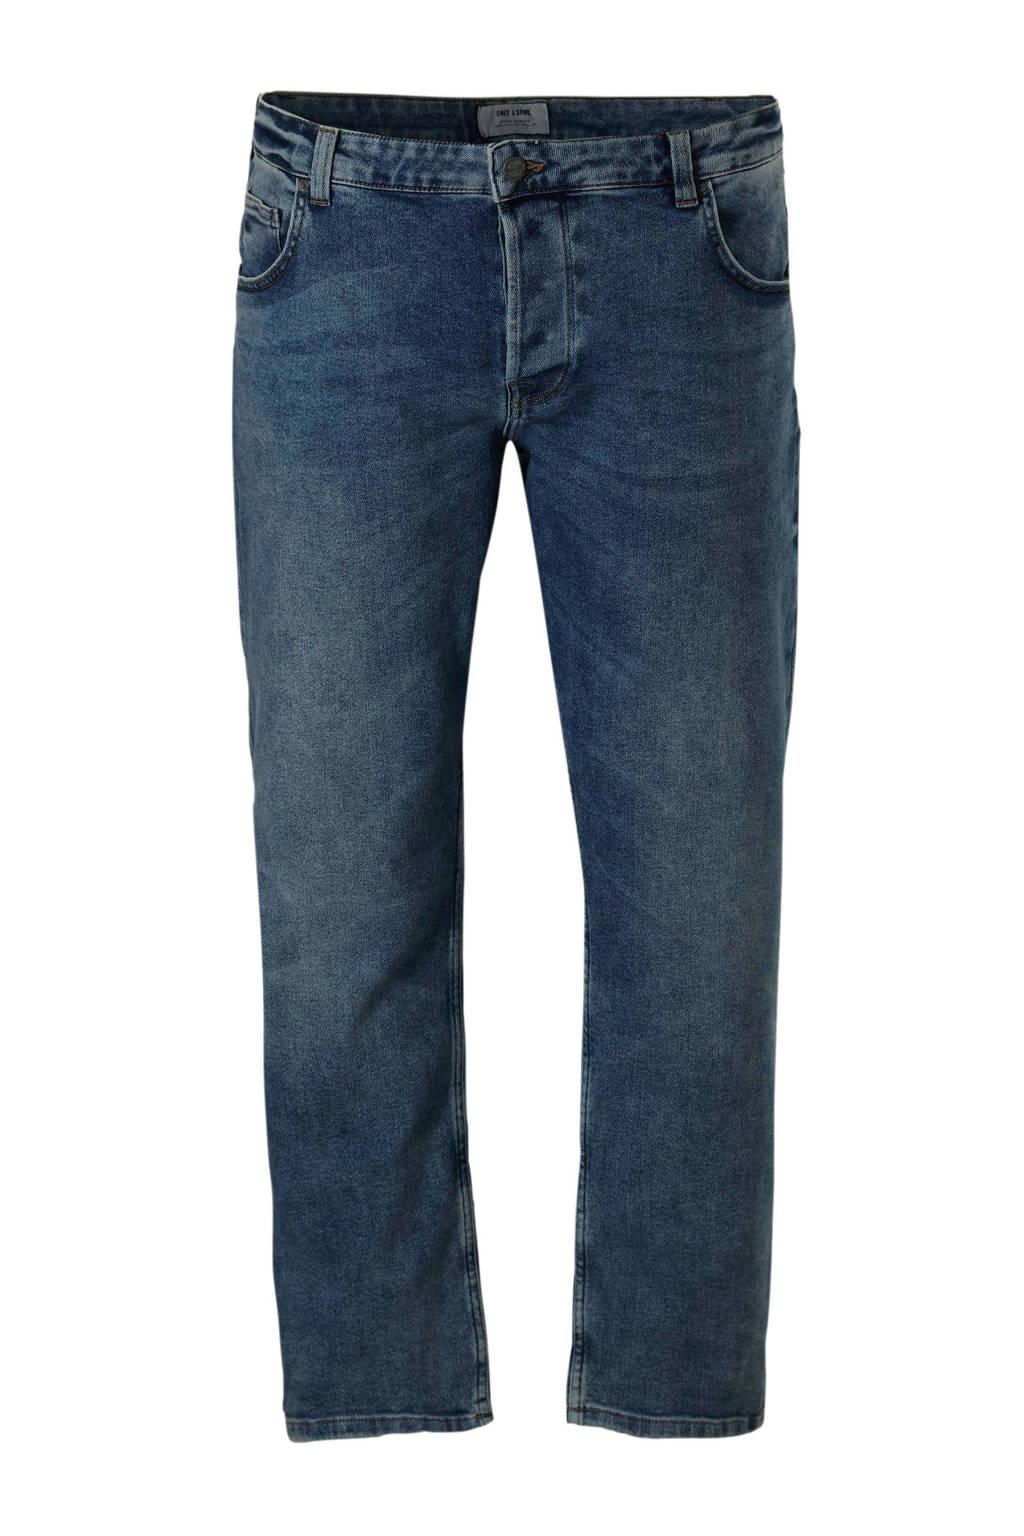 Only & Sons PLUS slim fit jeans, Light denim